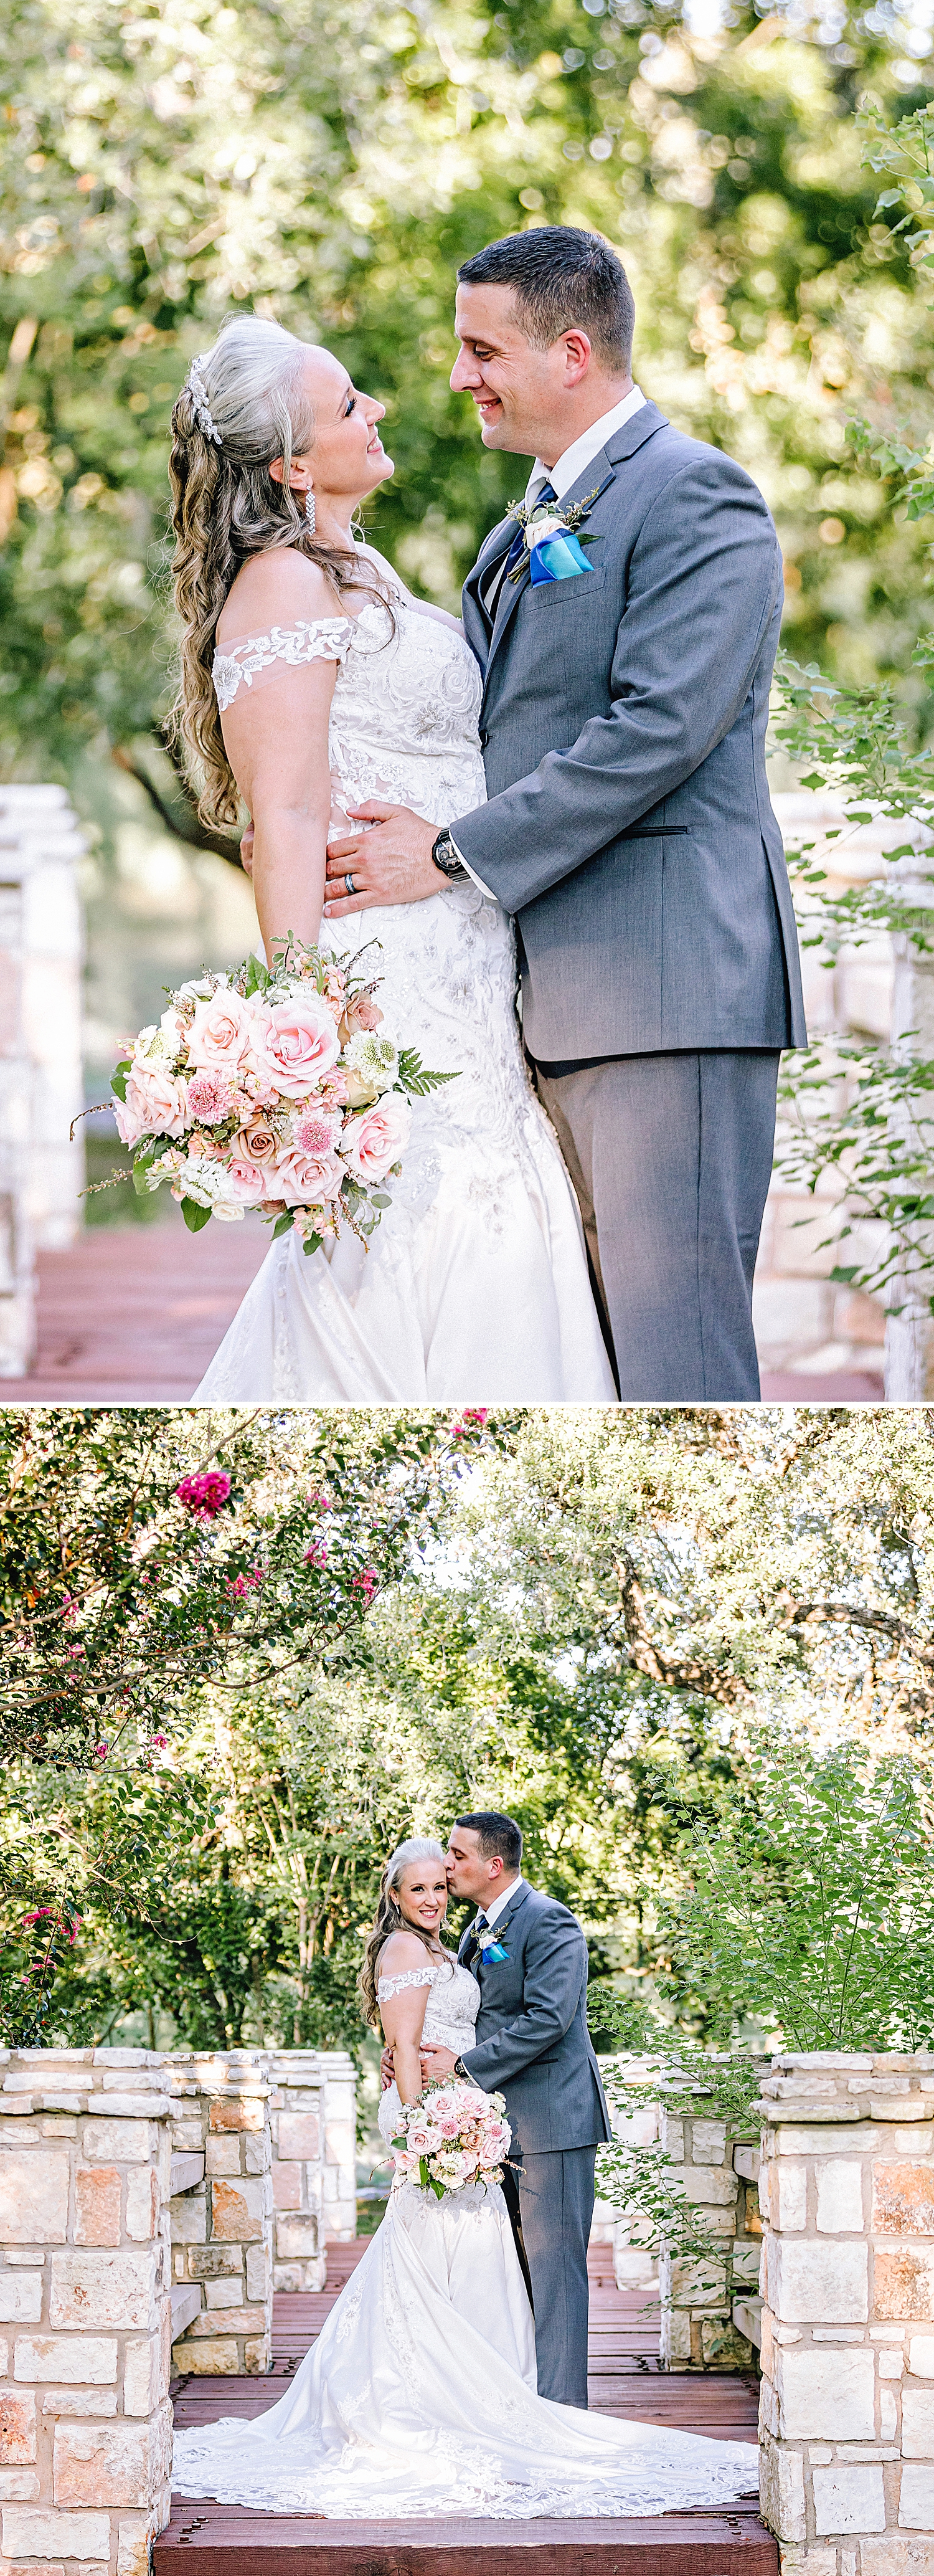 The-Club-at-Garden-Ridge-Military-Wedding-Carly-Barton-Photography_0044.jpg